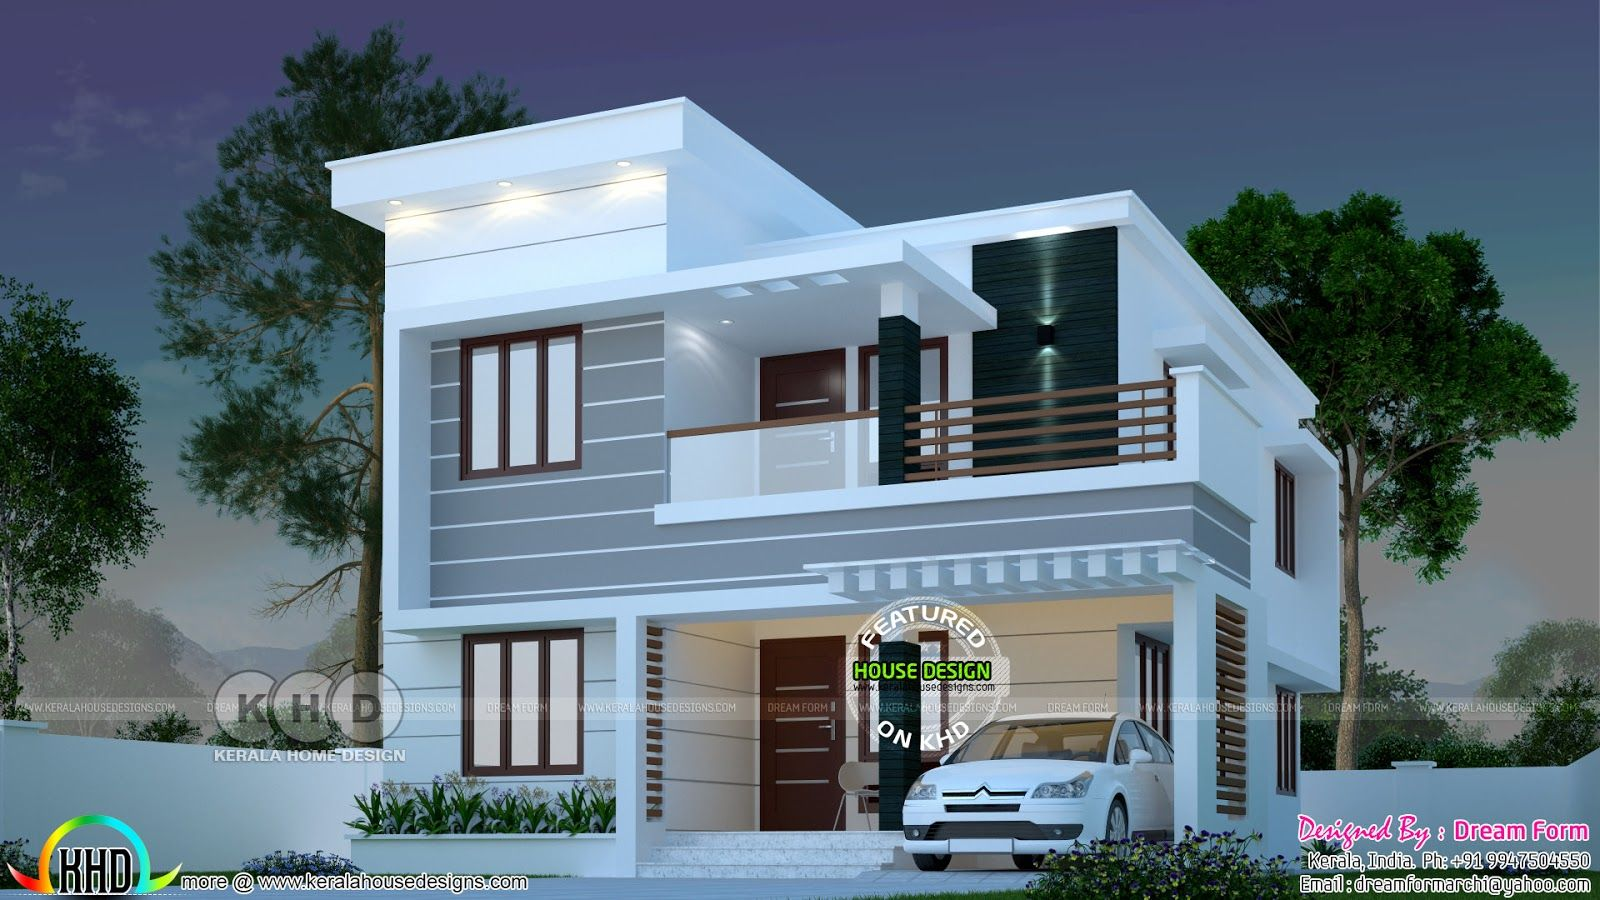 modernhomeneathouse.jpg (1600×900) Duplex house